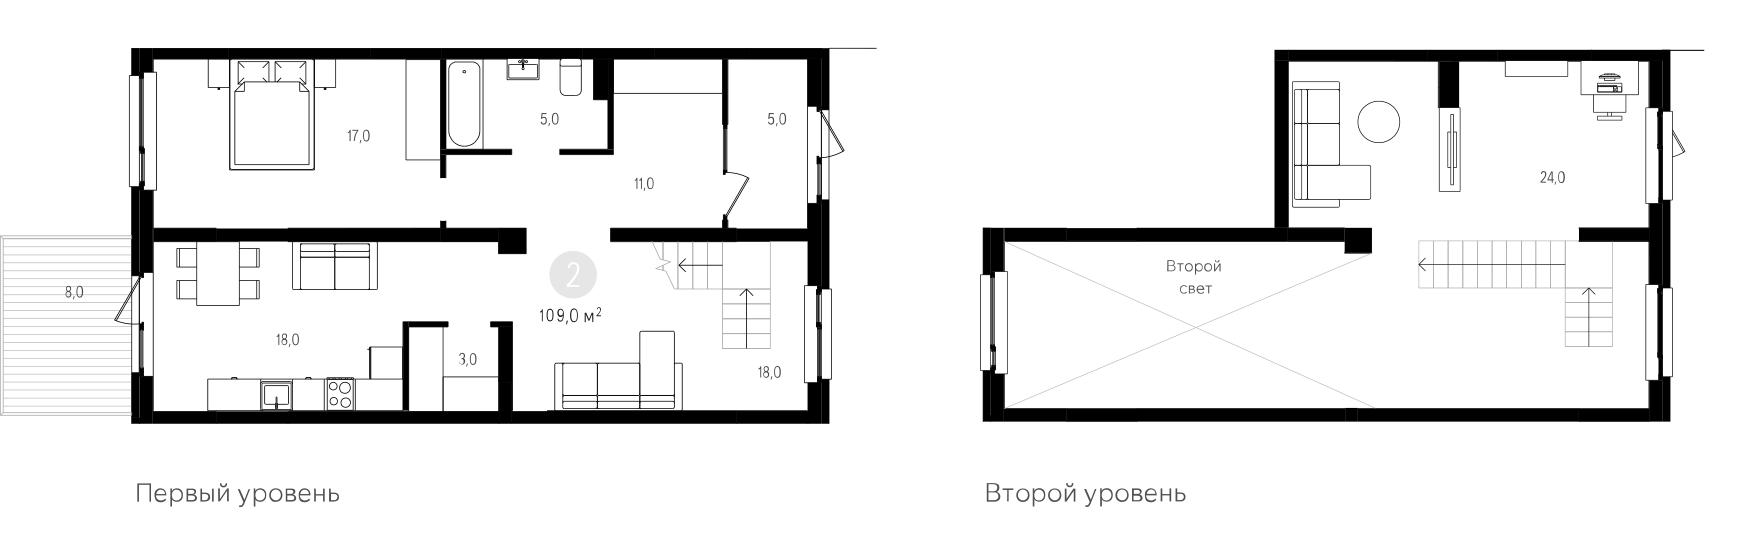 4Е-к.кв, 109 м²